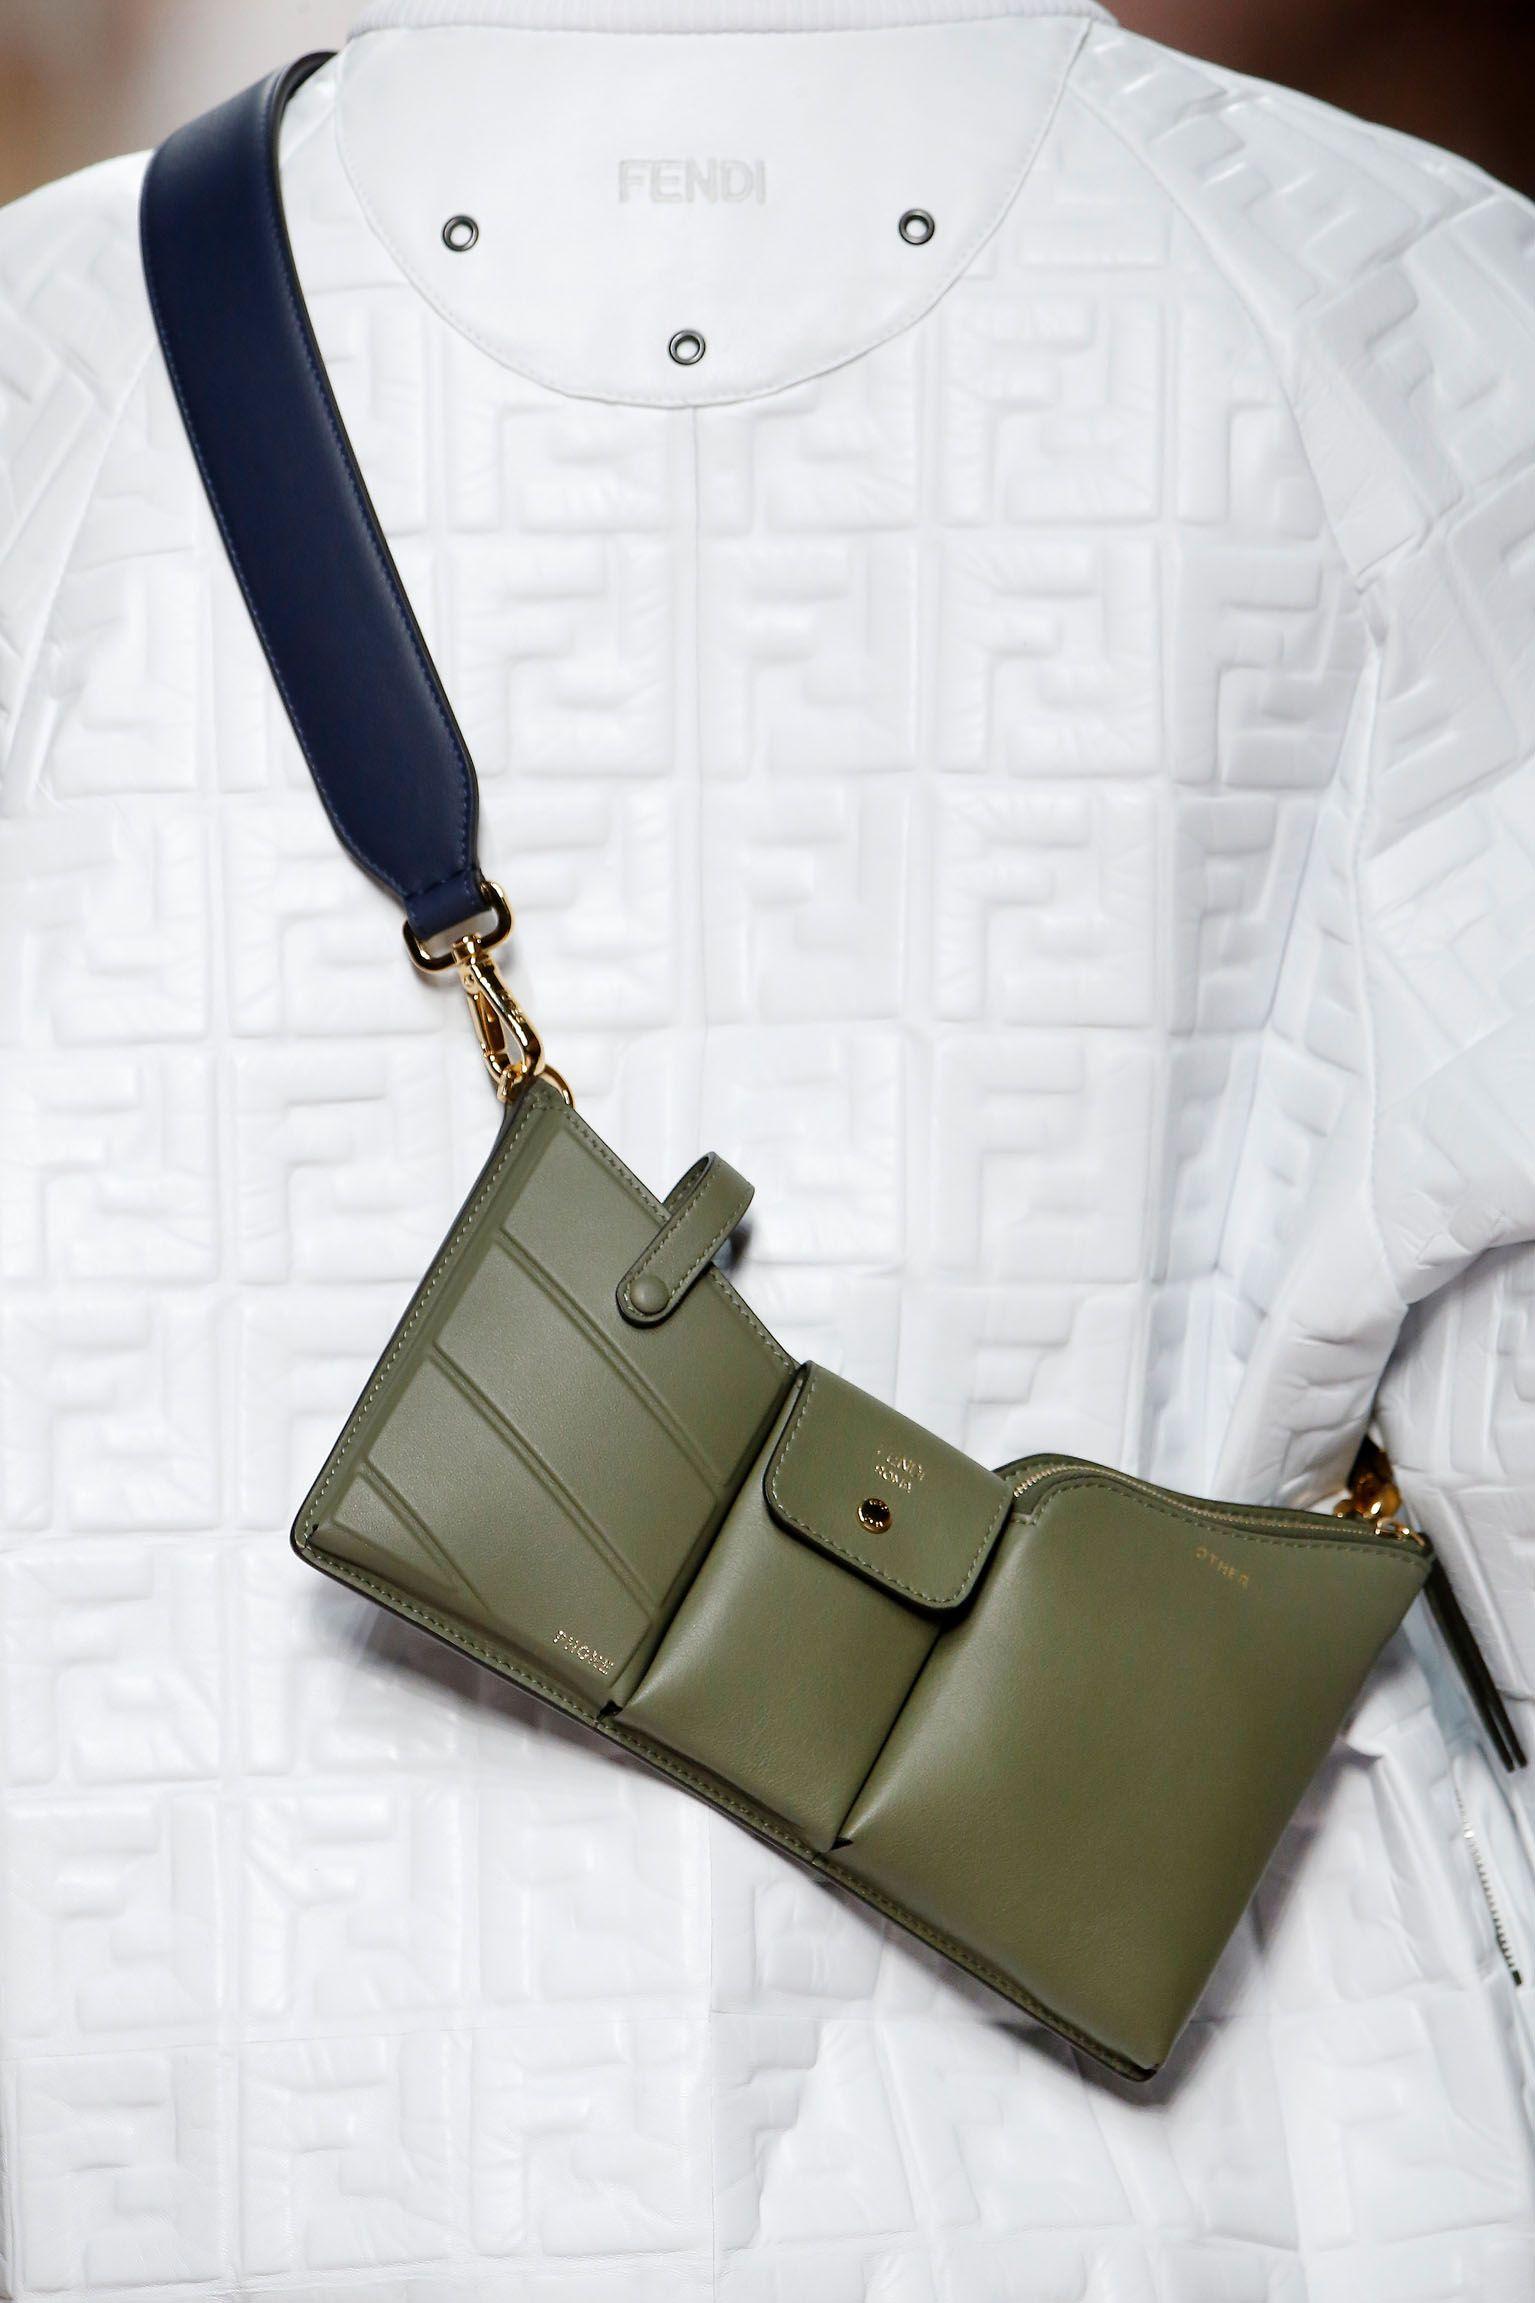 5523a89396 Fendi Women's Spring/Summer 2019 Fashion Show | Bags in 2019 | Bags ...